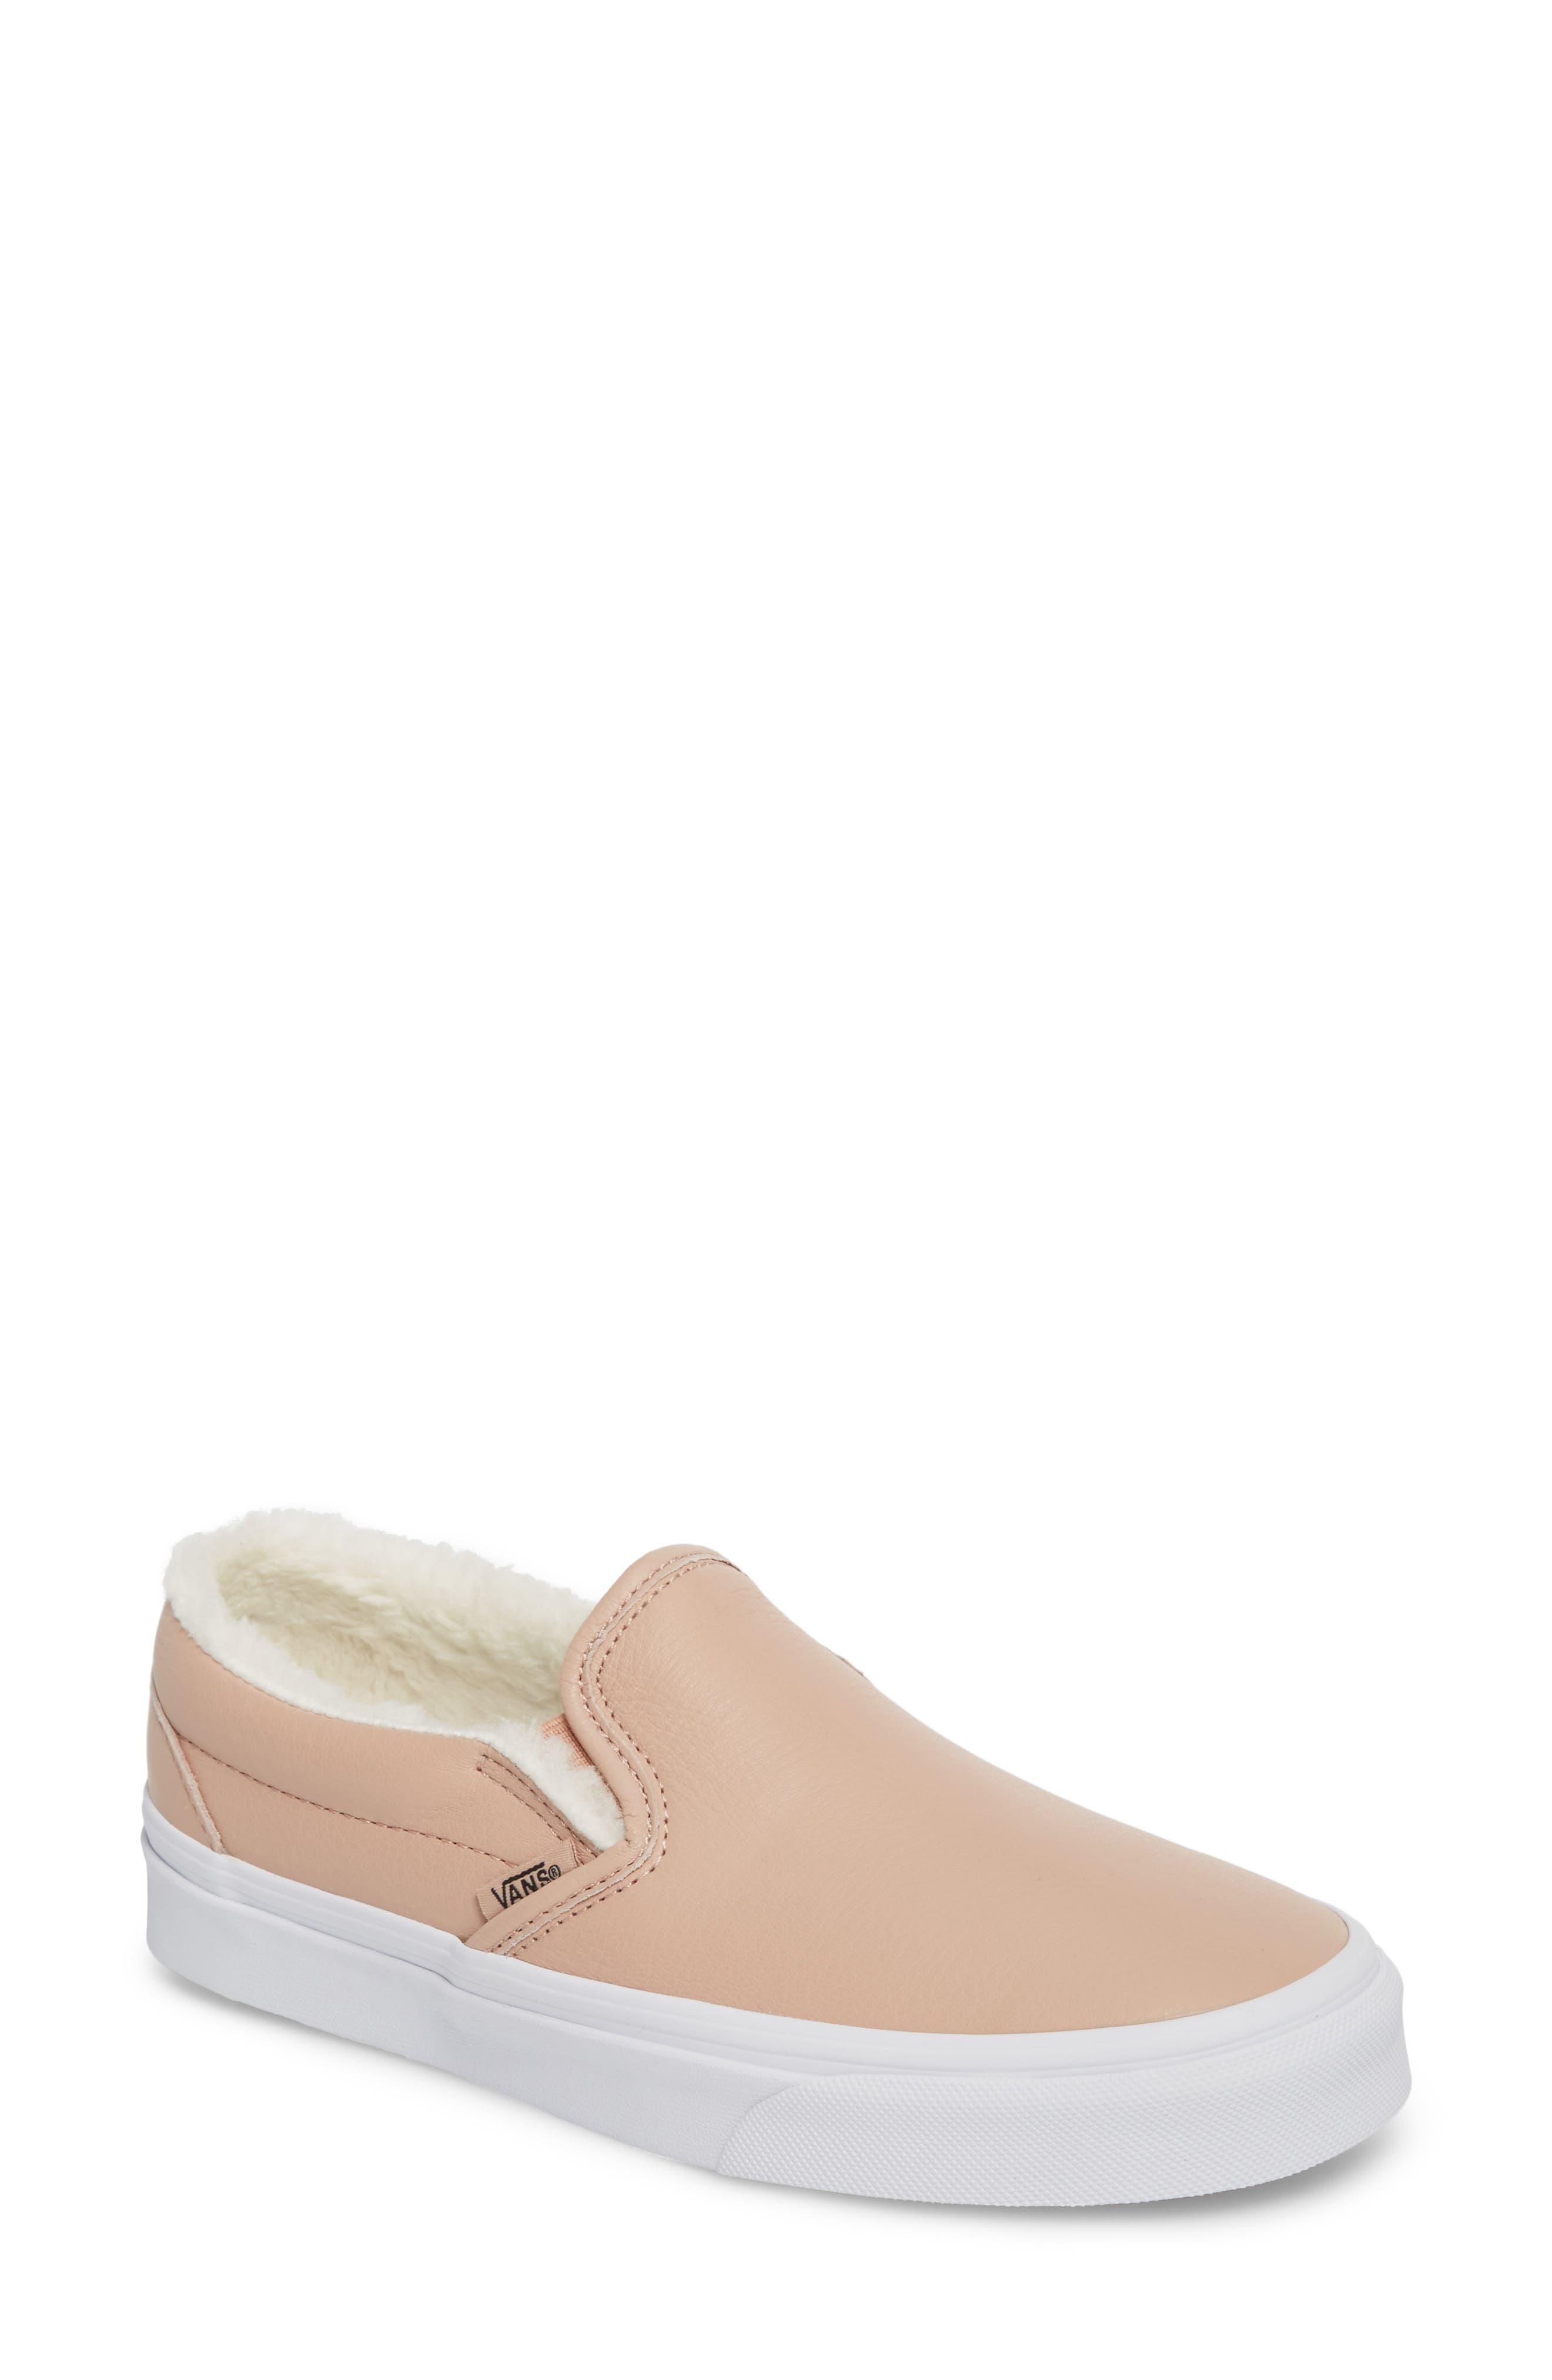 ,                             Classic Slip-On Sneaker,                             Main thumbnail 219, color,                             670